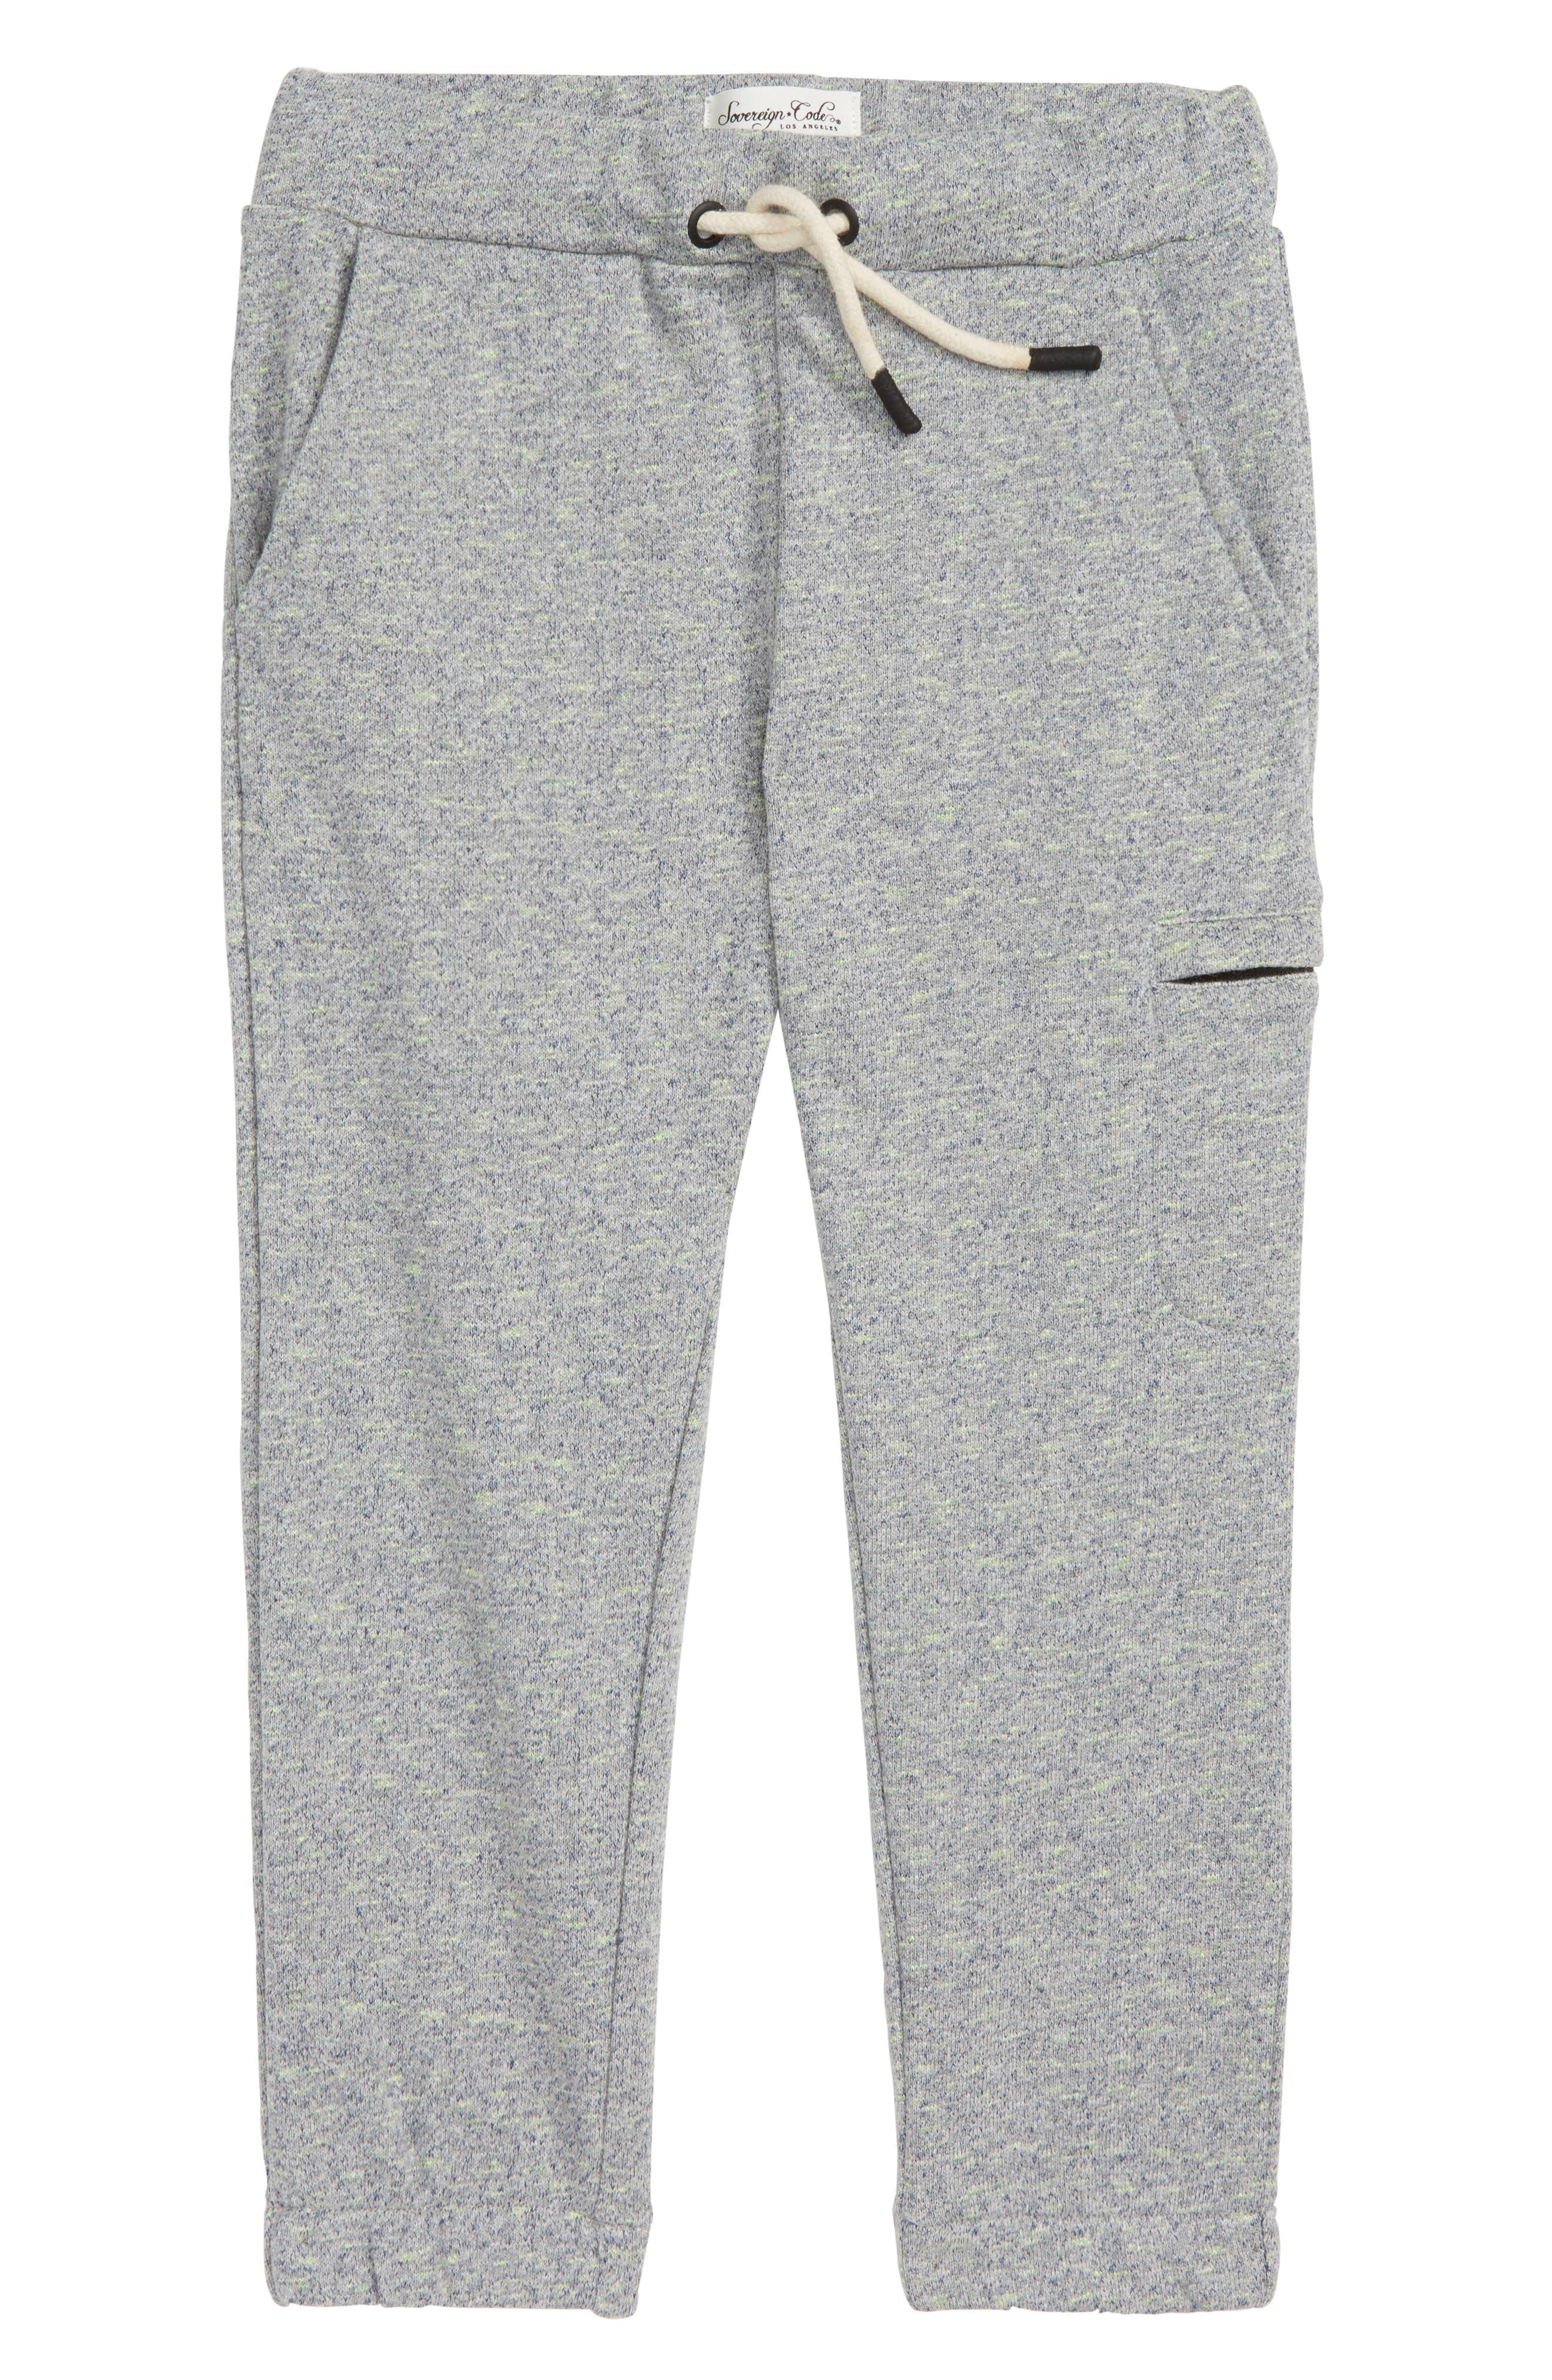 Chicago Pants,                             Main thumbnail 1, color,                             400